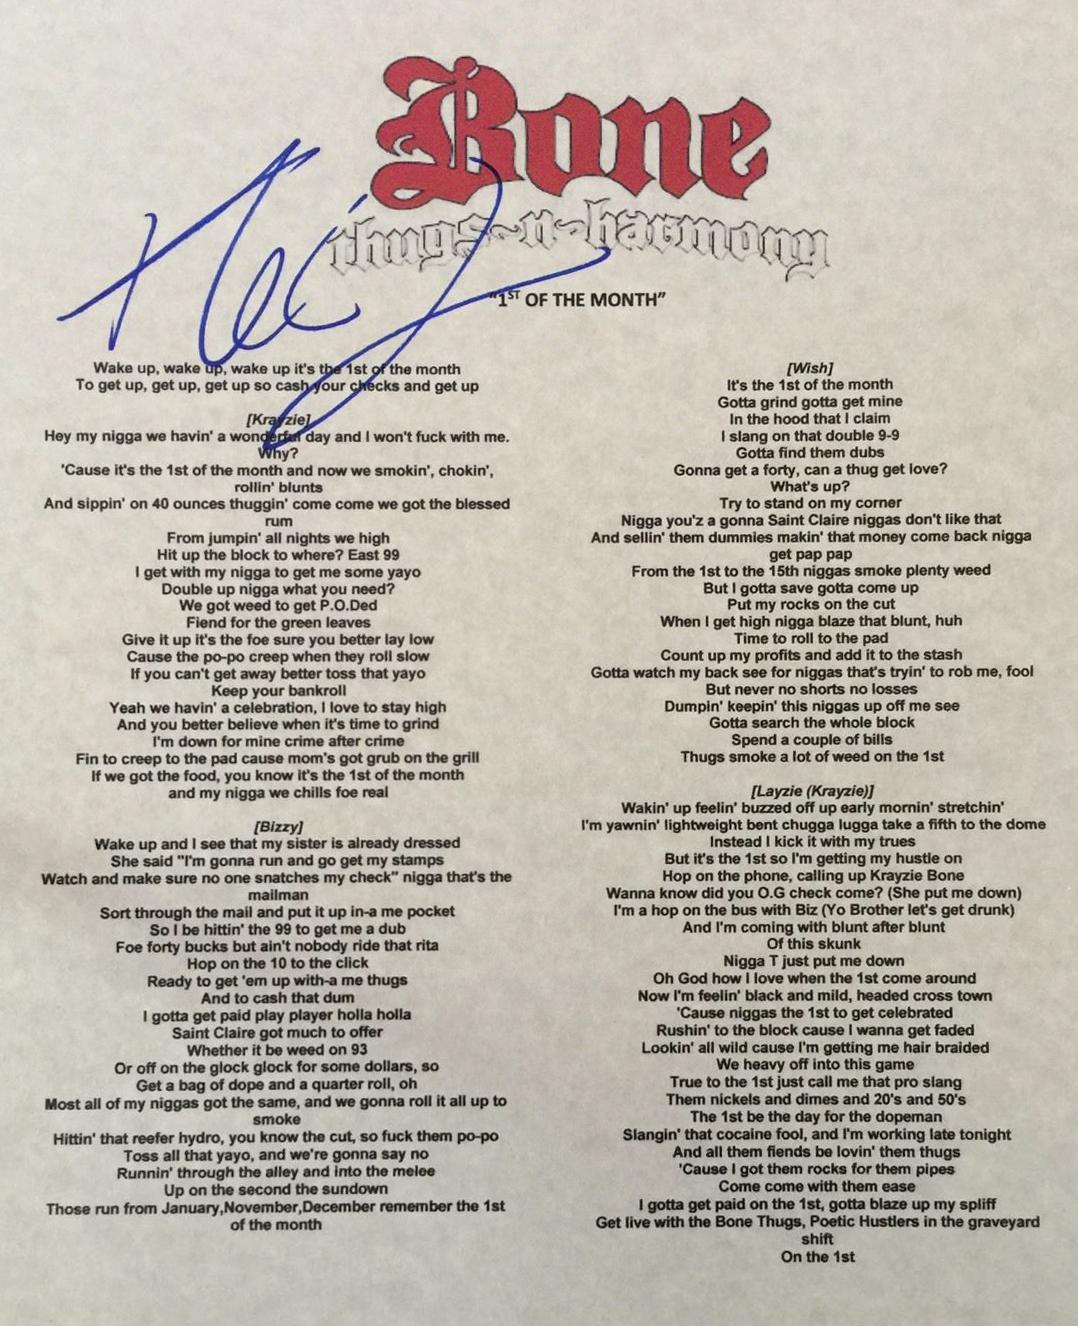 Bone Thugs-N-Harmony Lyrics 1st of tha month autographed